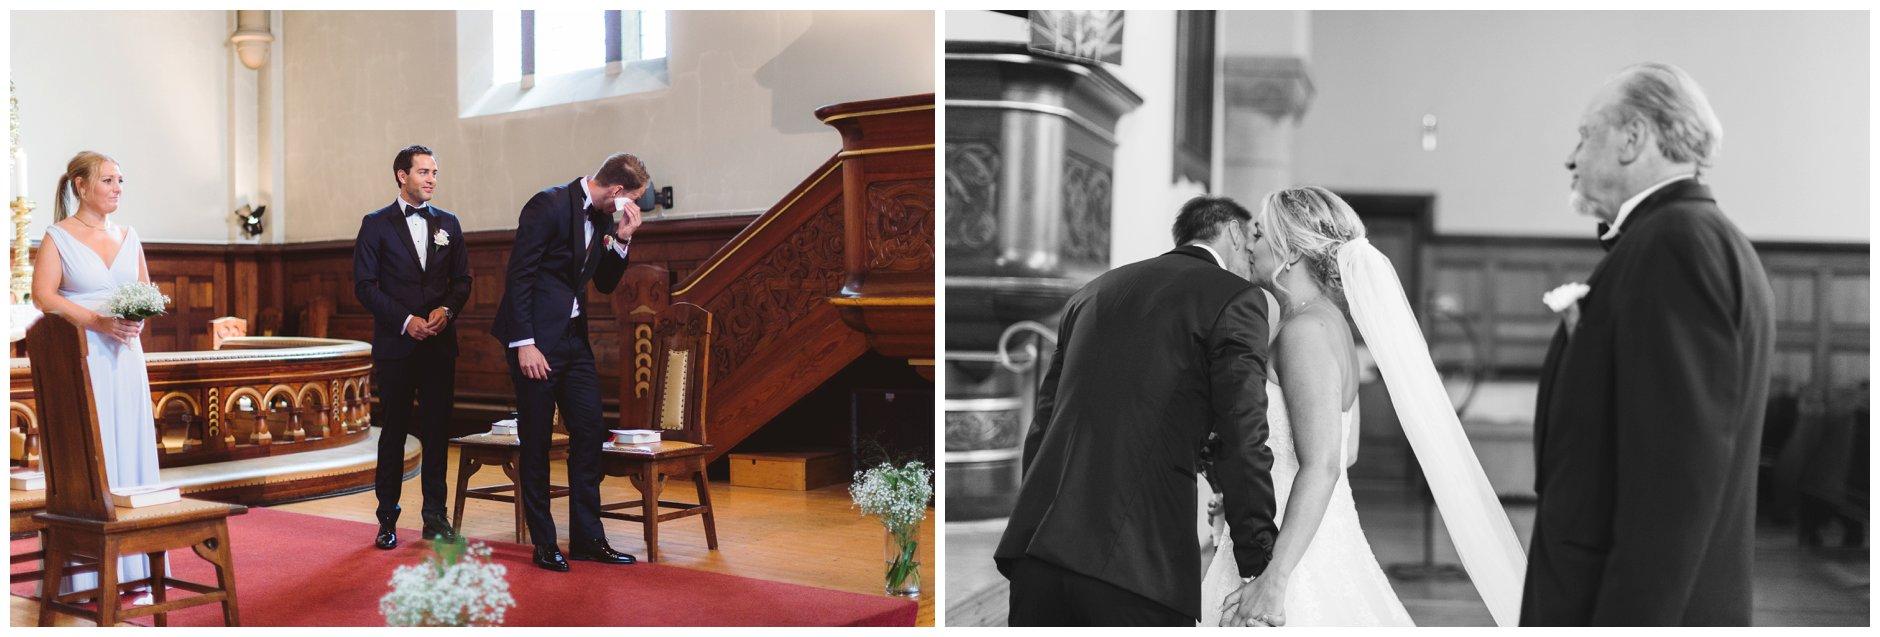 Fotograf-Eline-Jacobine-Bryllup-Villa-Eckbo-Fagerborg-kirke-The-Thief-Oslo_0048